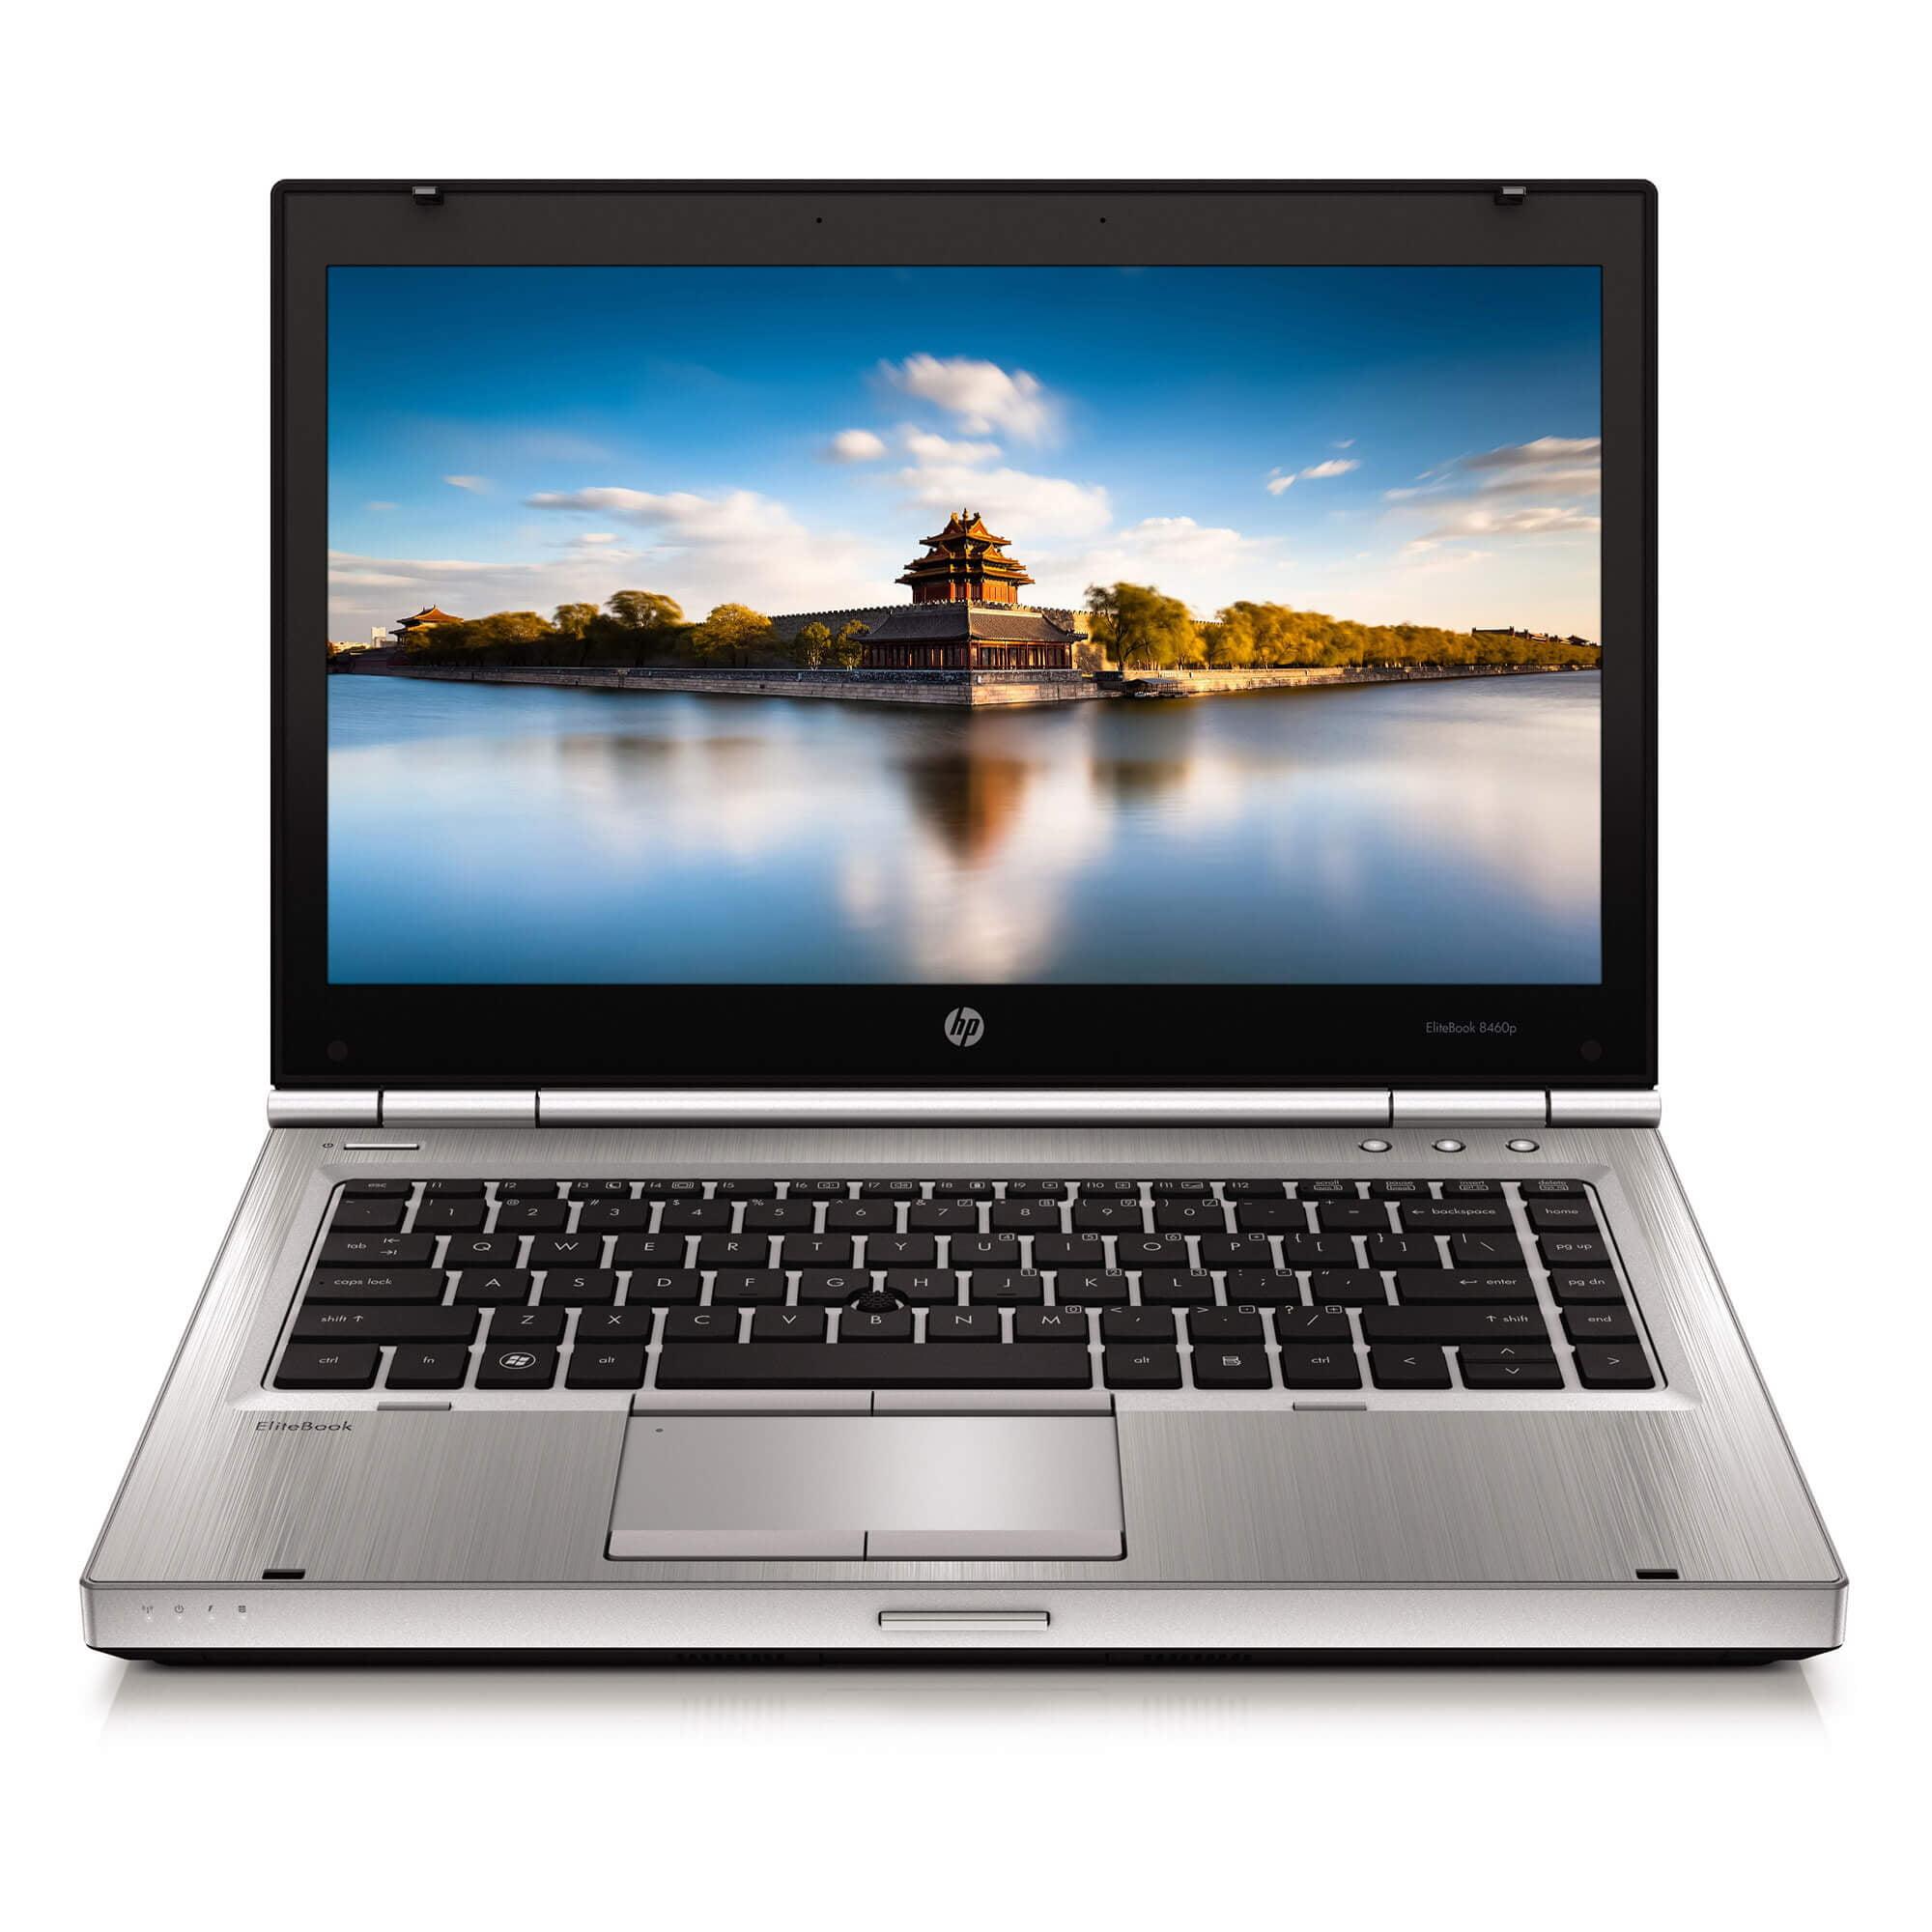 HP Laptop Elitebook 8460P Intel i5 8gb 320gb HD DVD Wifi Windows 10 Professional